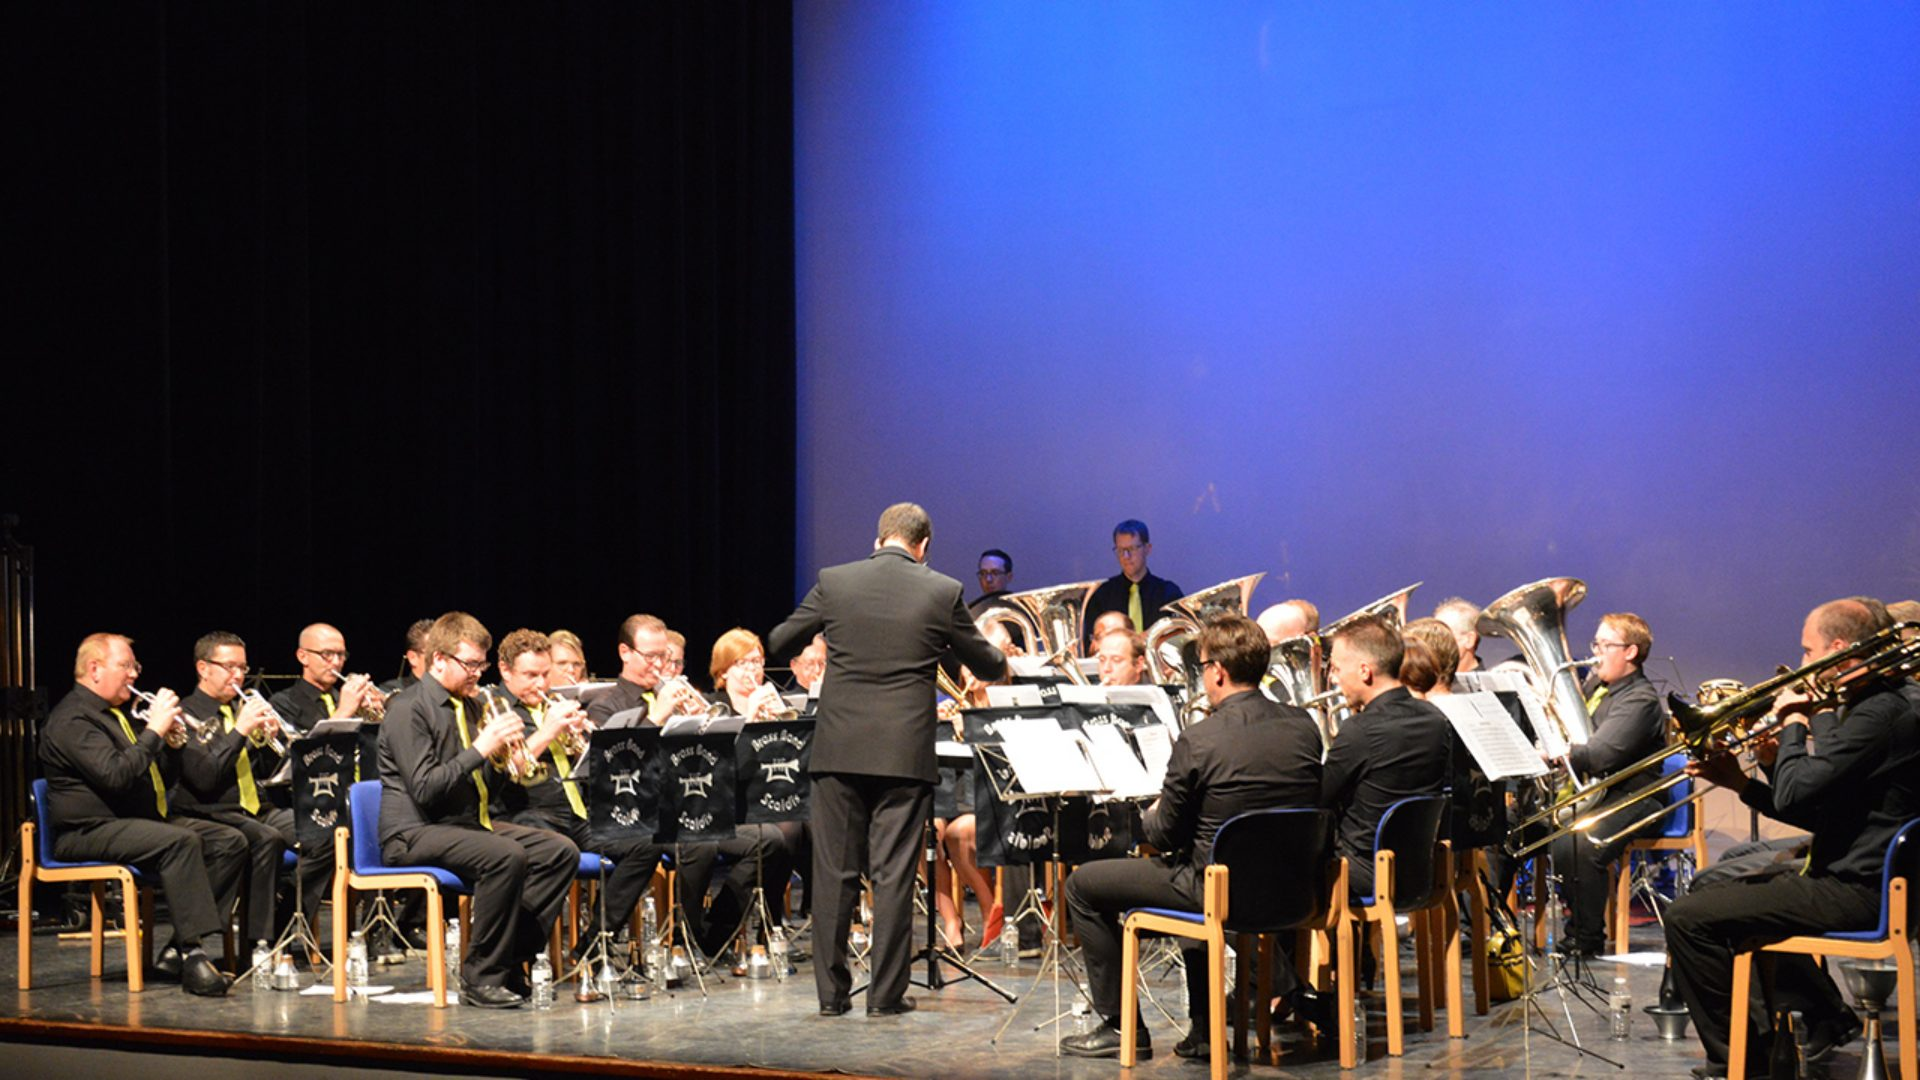 Brass Band Scaldis